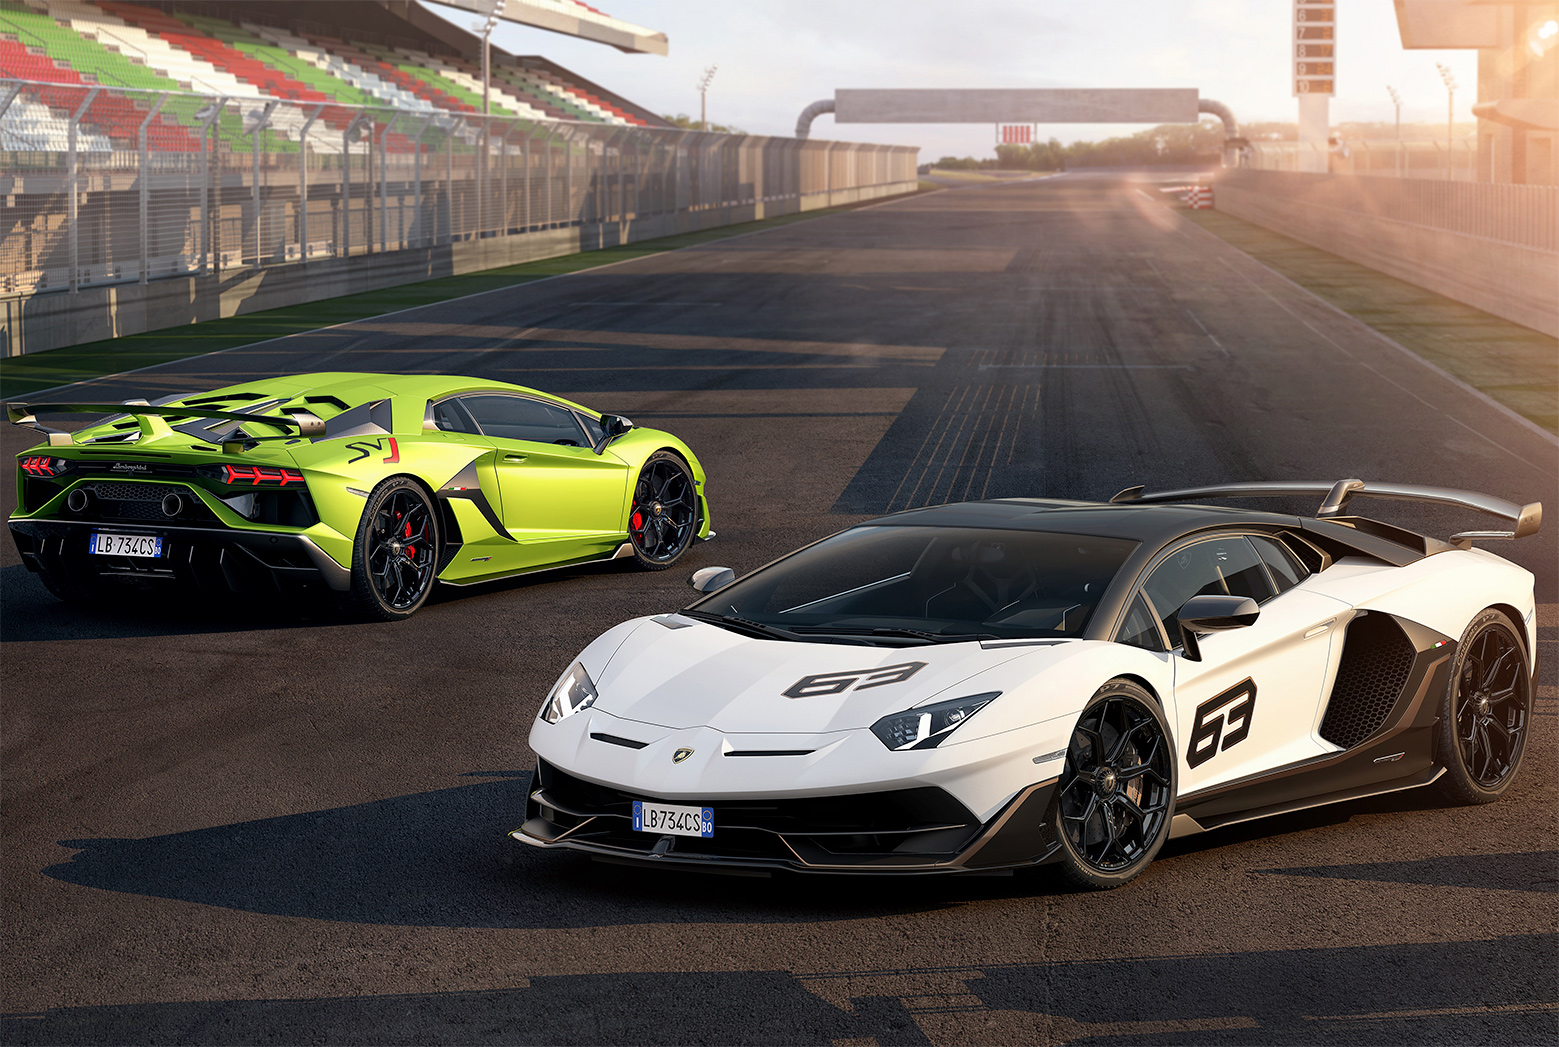 TrackWorthy - Lamborghini Aventador SVJ 63 (3)